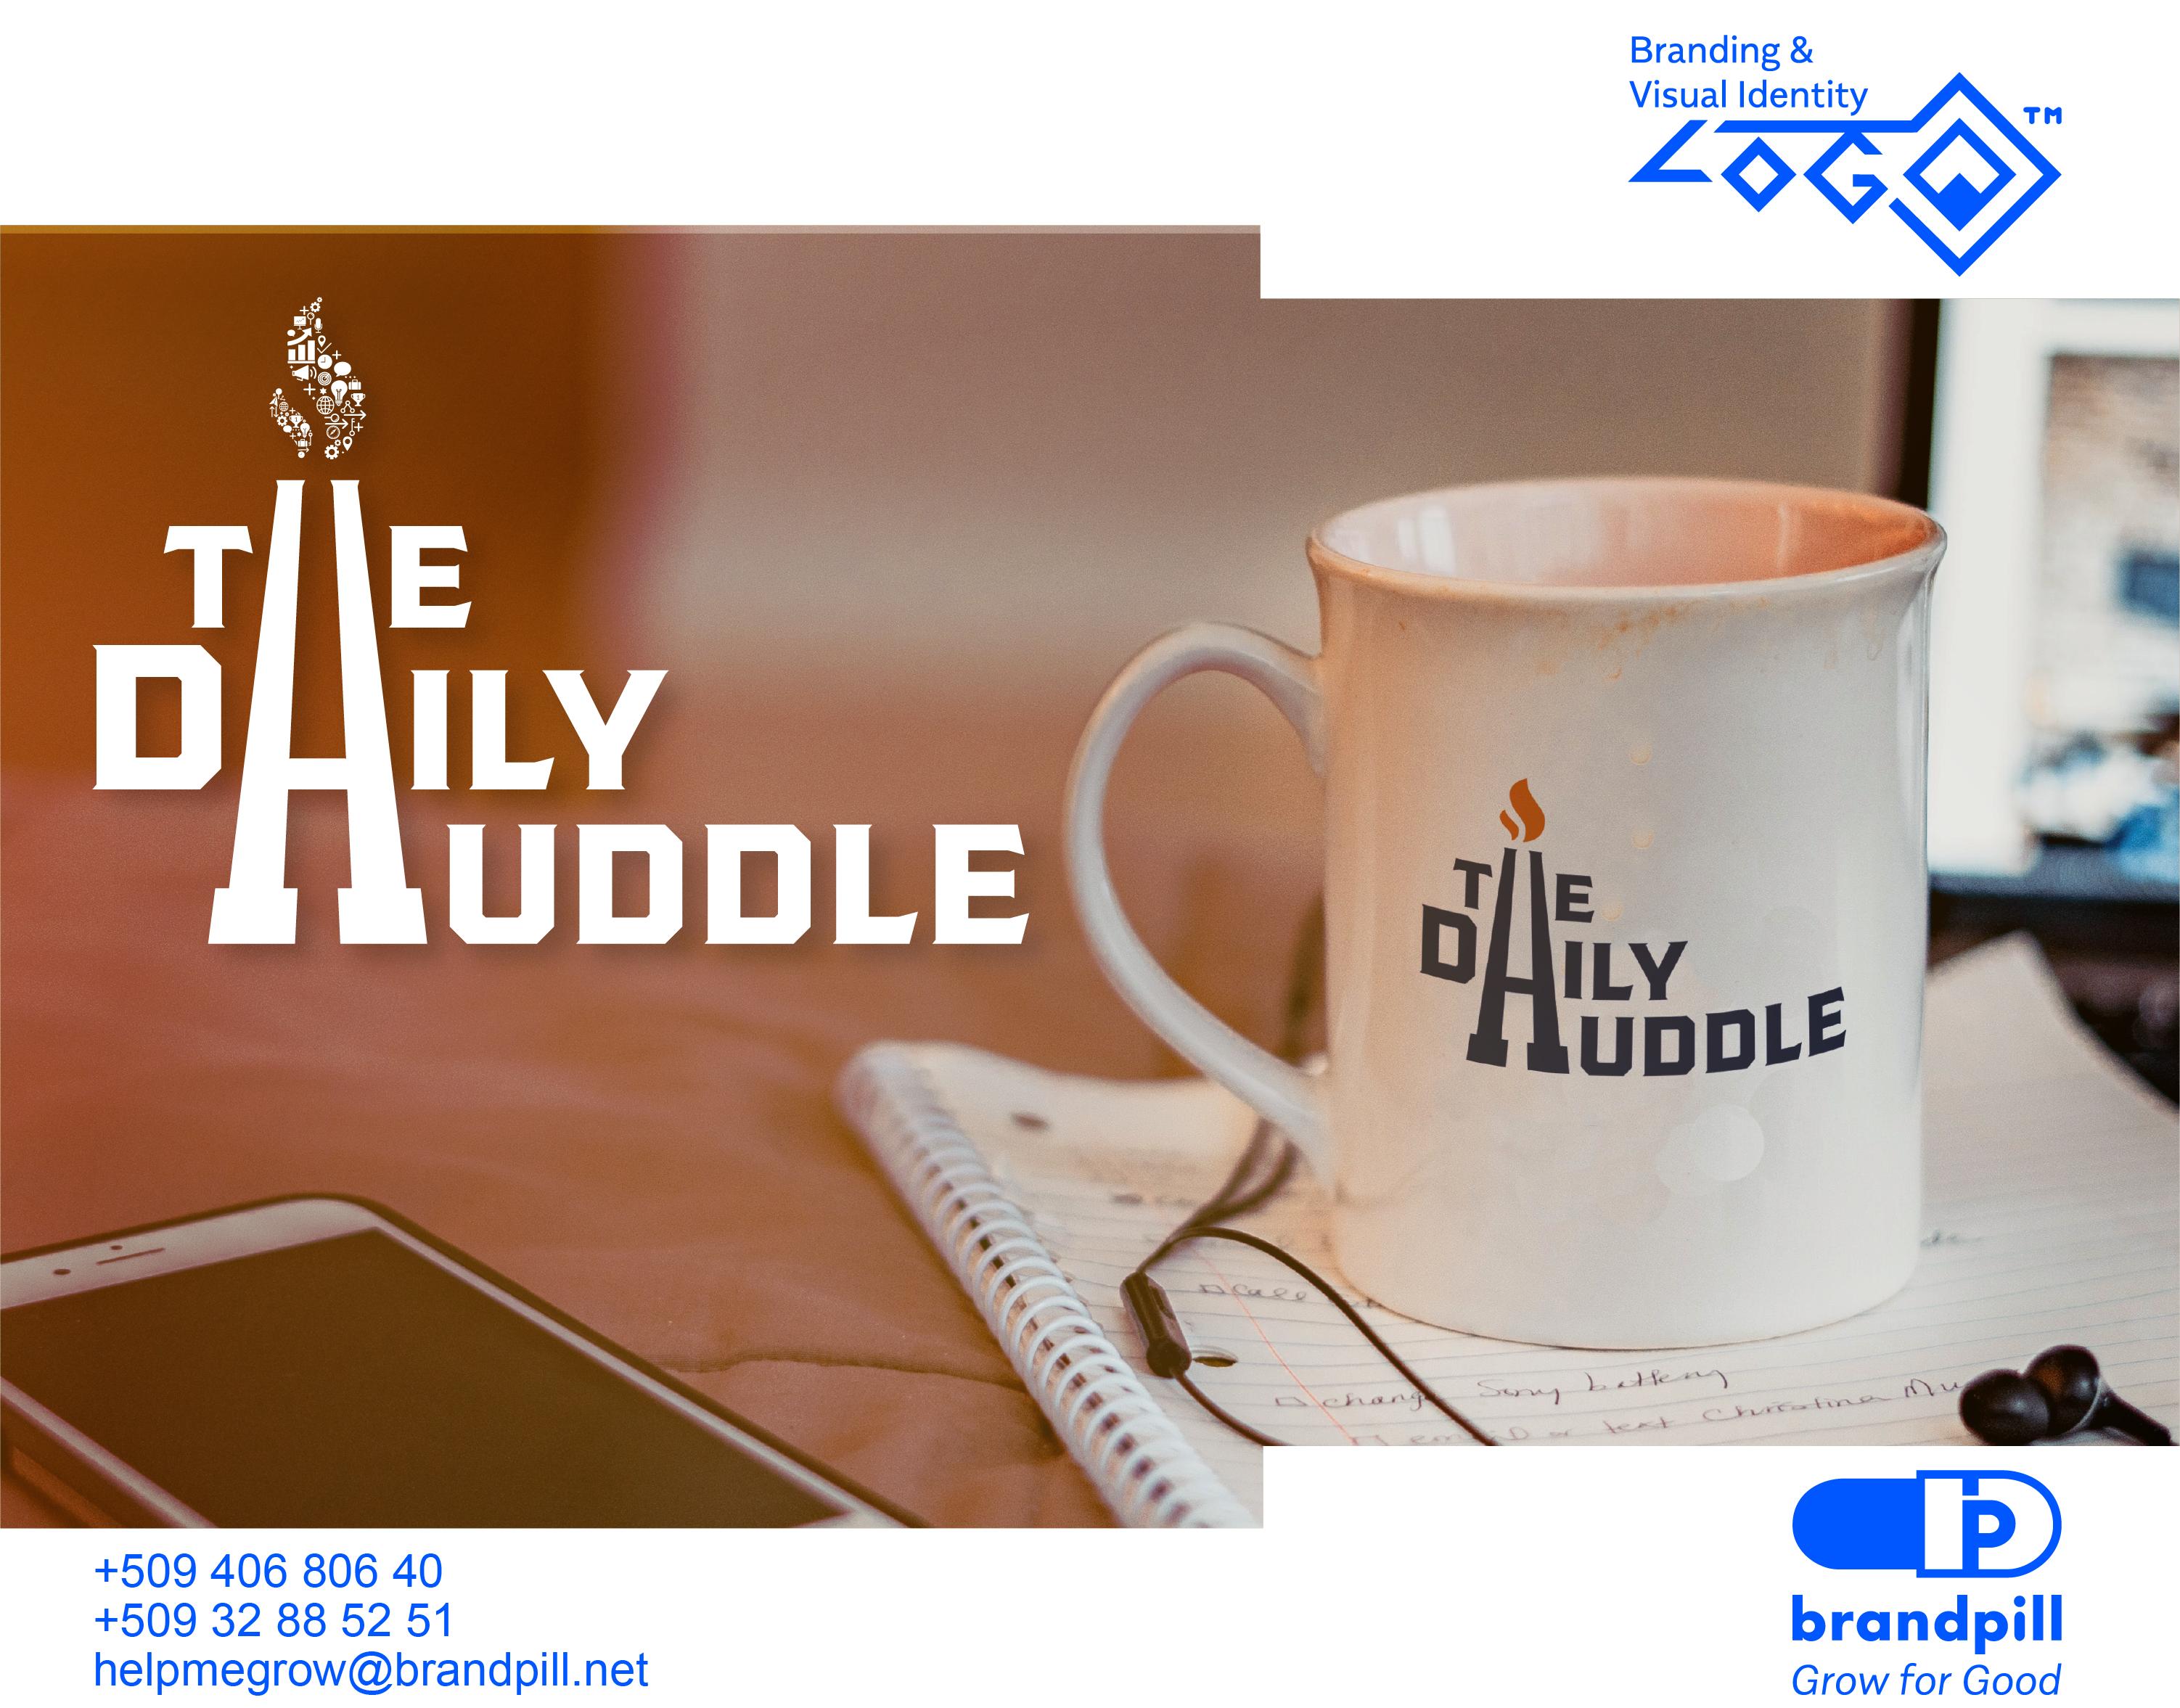 Daily Huddle Branding by brandpill